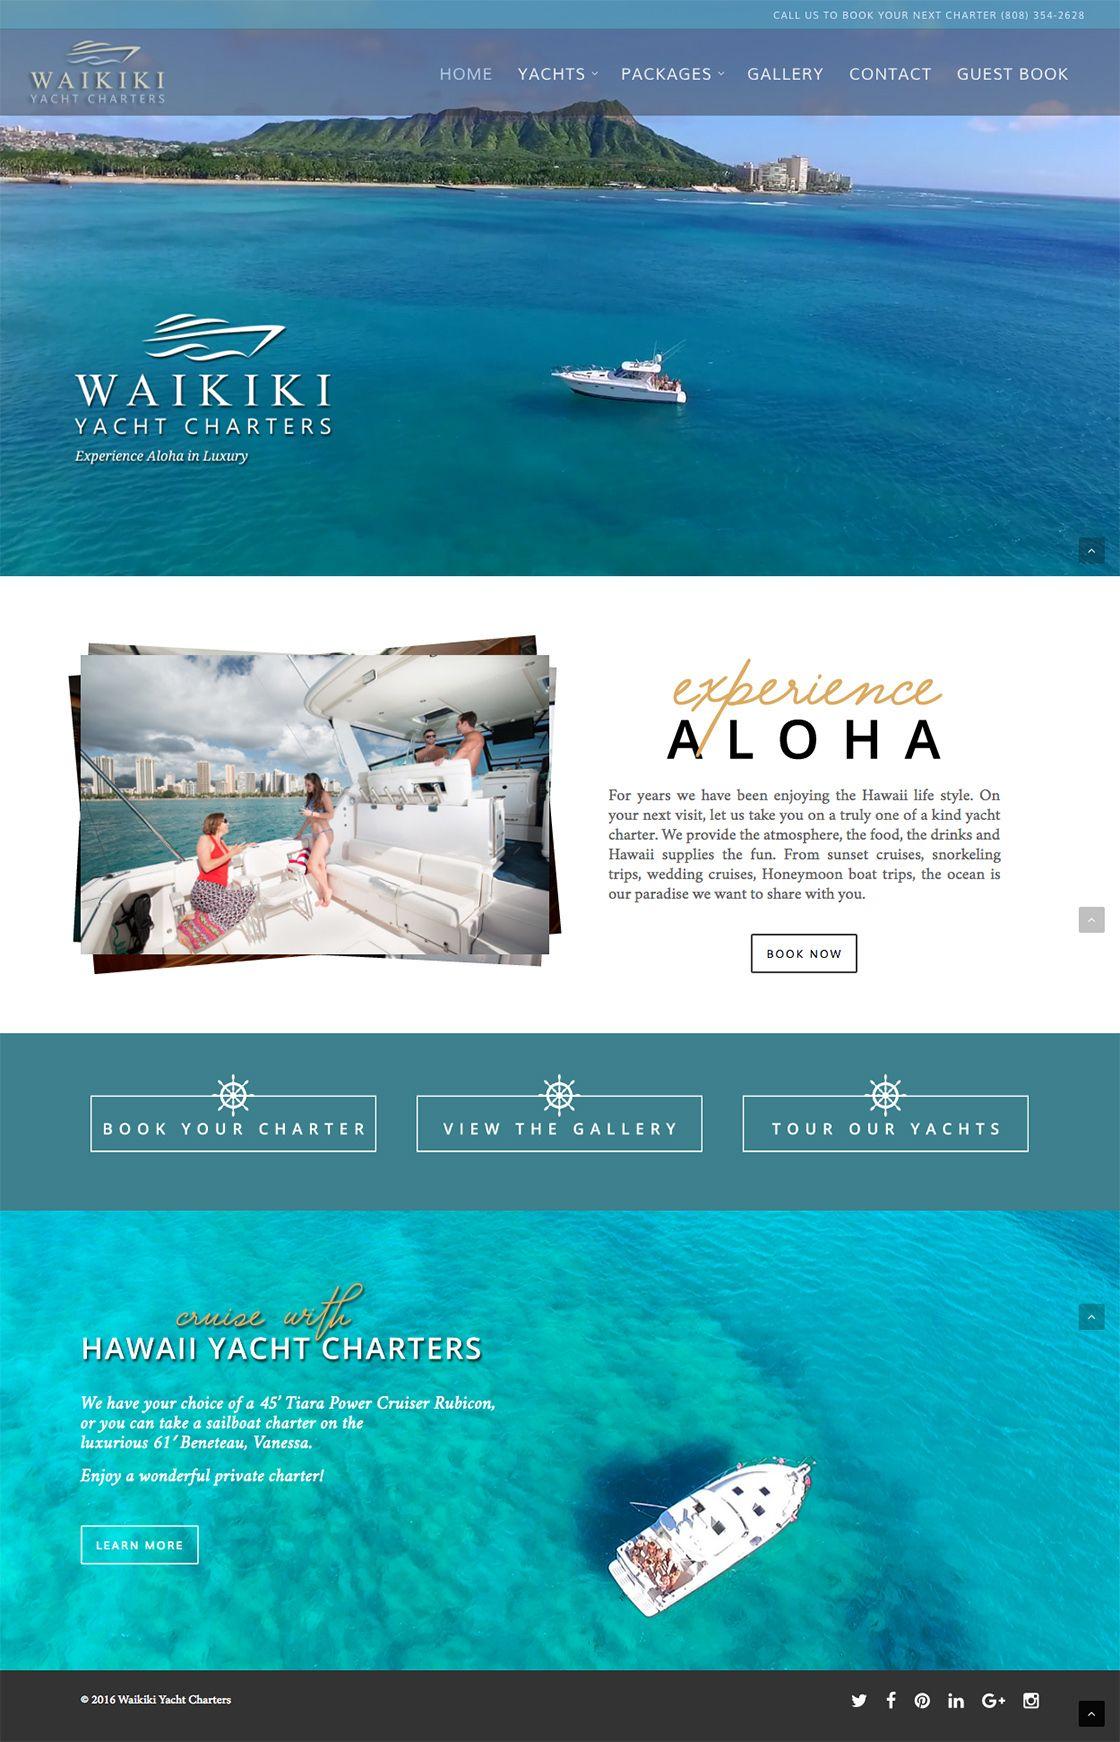 Brand Web Design Portfolio Complete Branding Website Design Packages Travel Website Design Portfolio Web Design Small Business Website Design